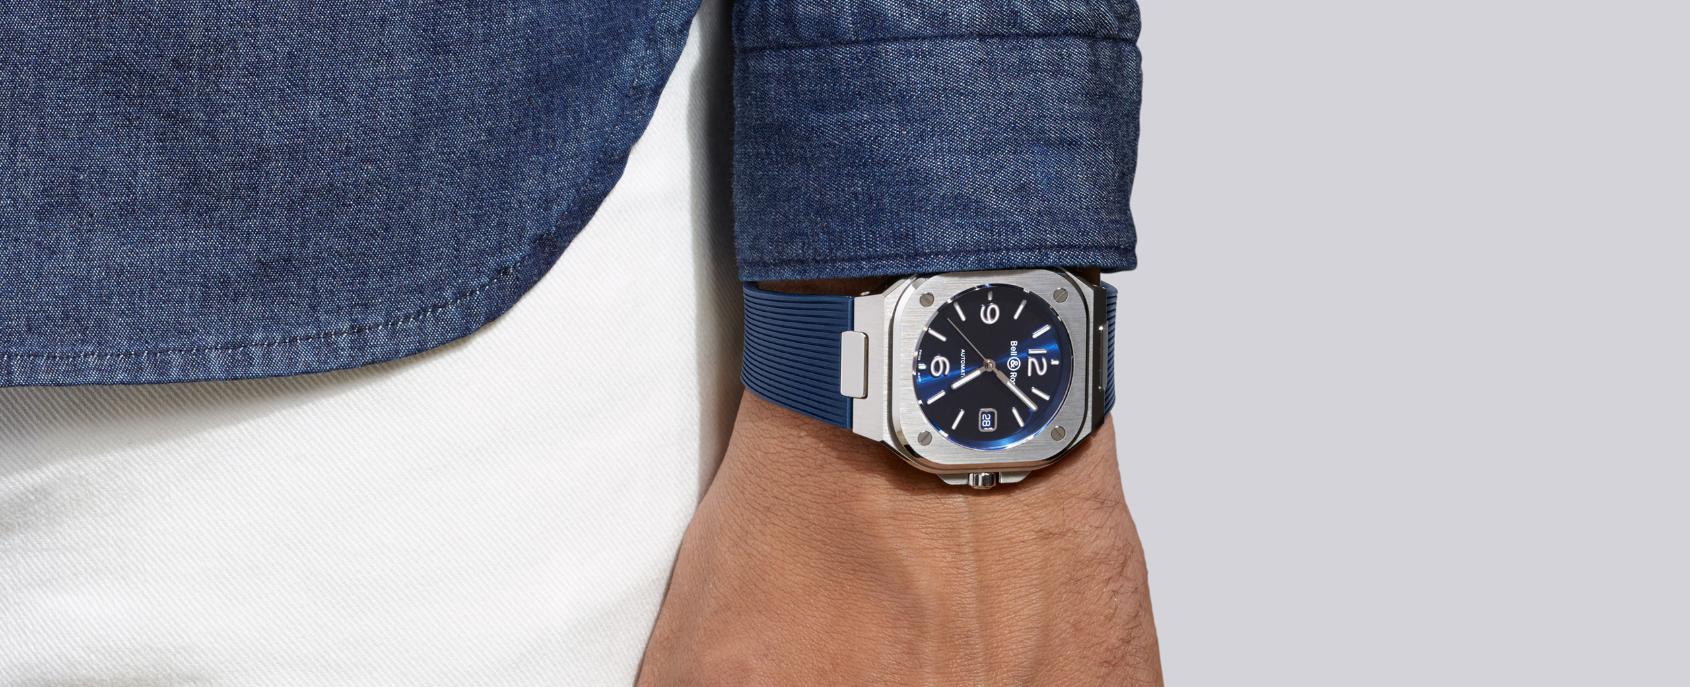 Vacheron Constantin have the most versatile integrated bracelet watch